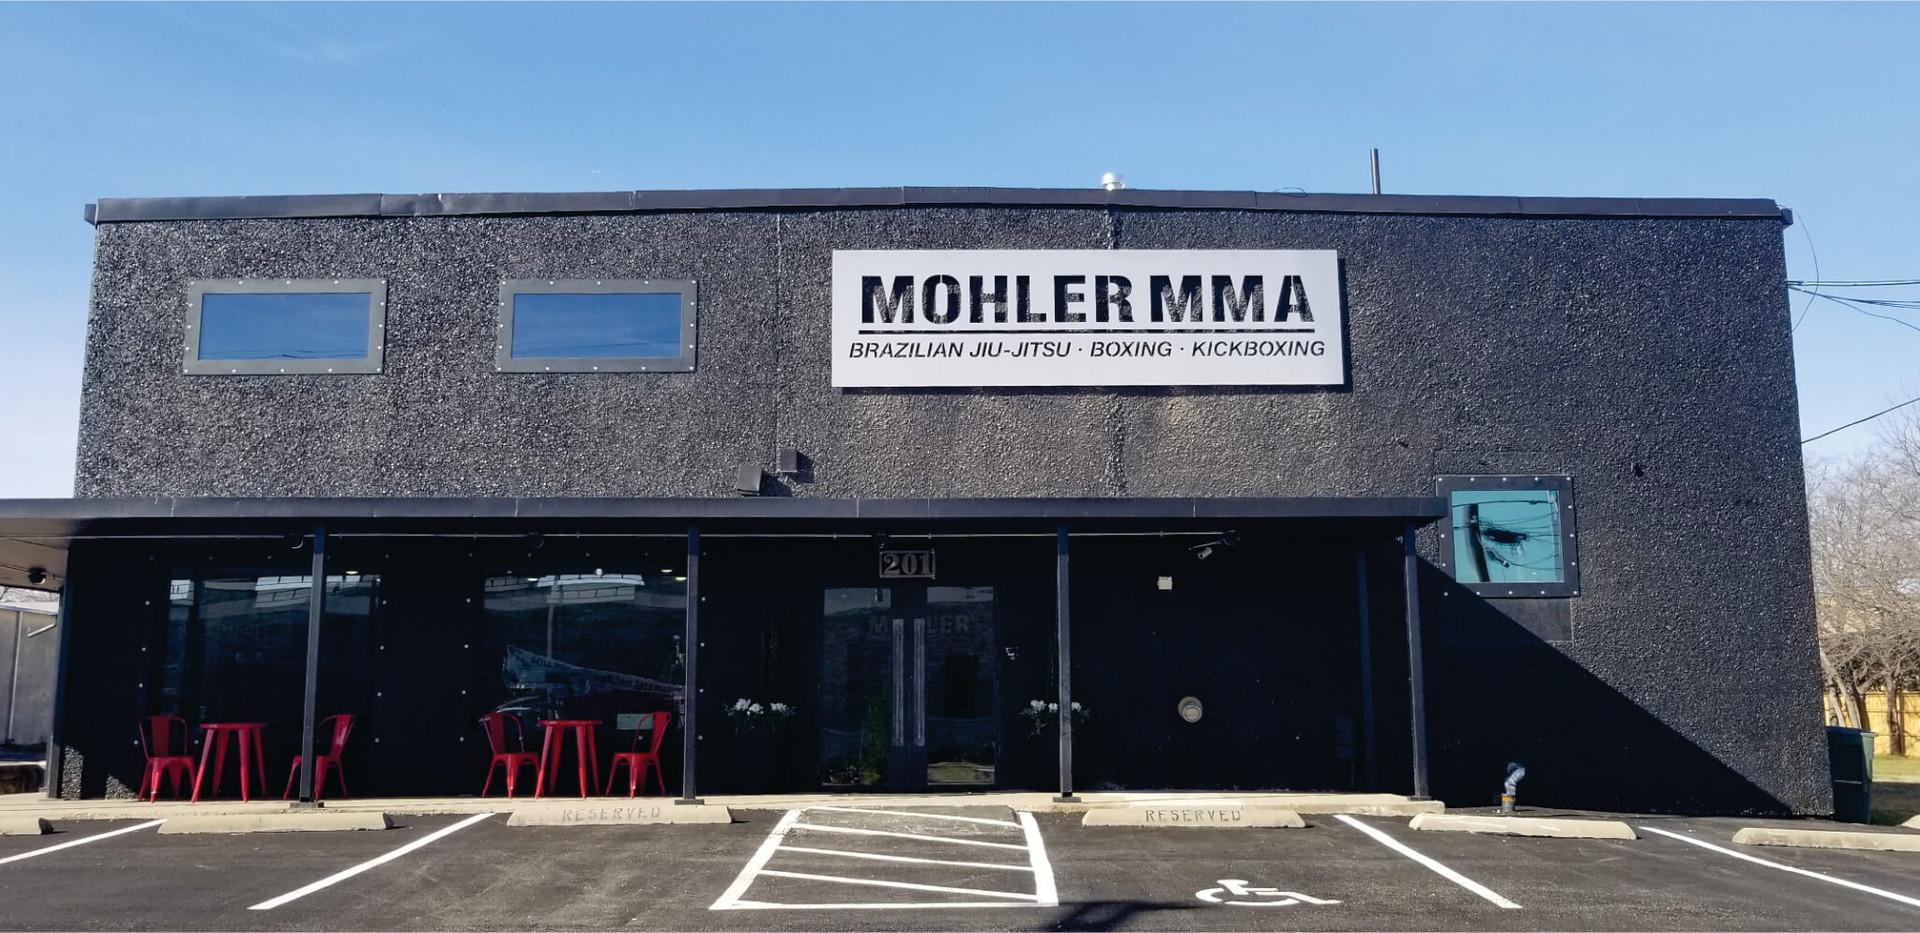 Mohler MMA | Frank Dale Construction